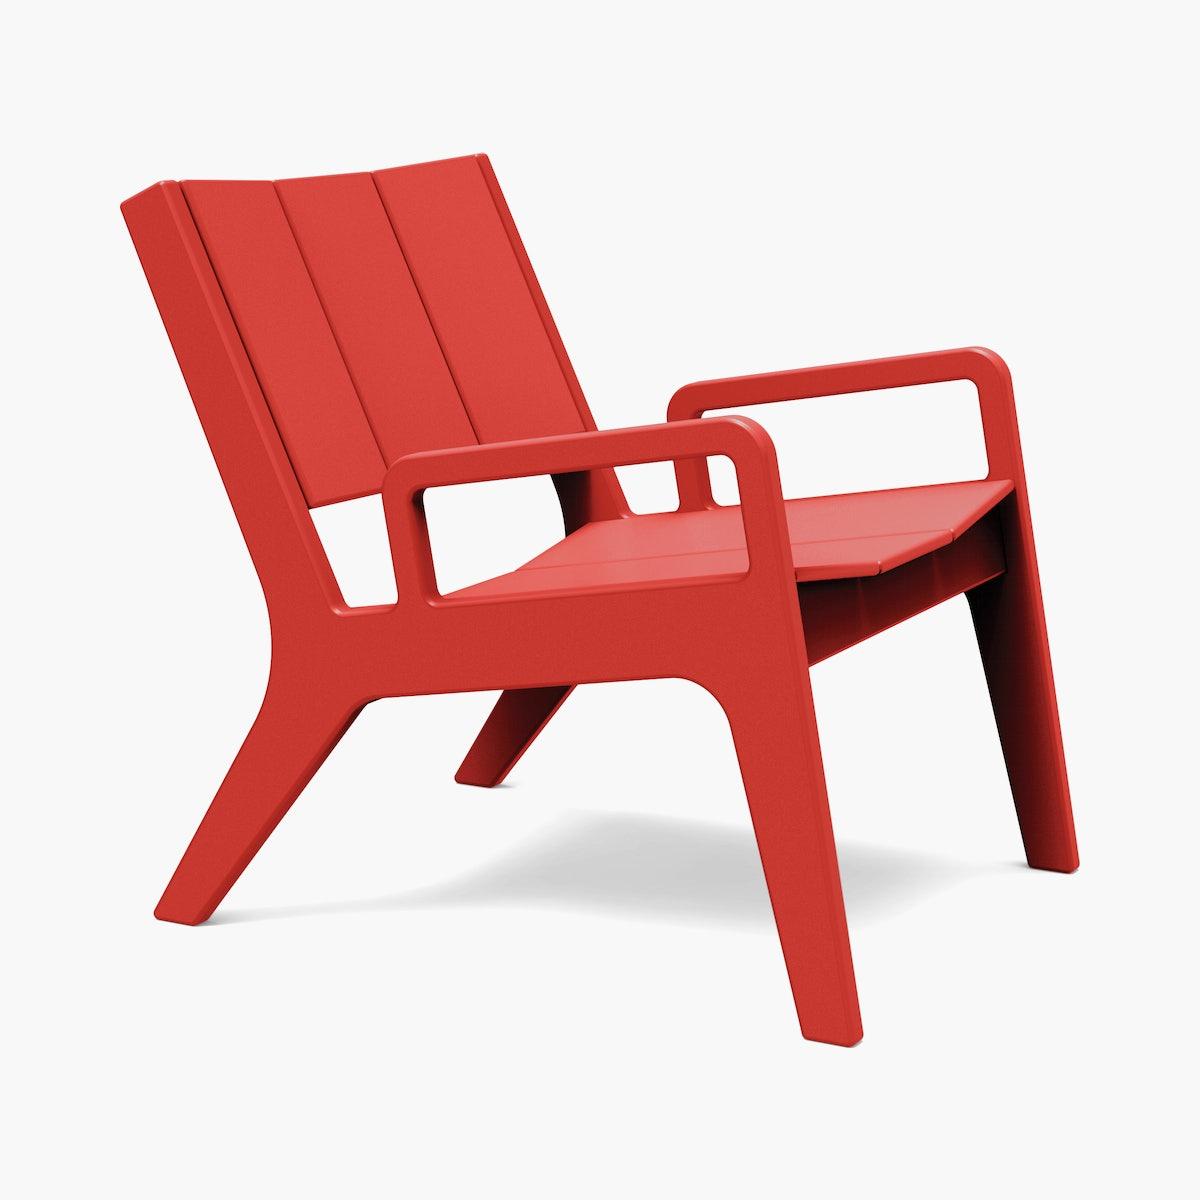 No. 9 Lounge Chair